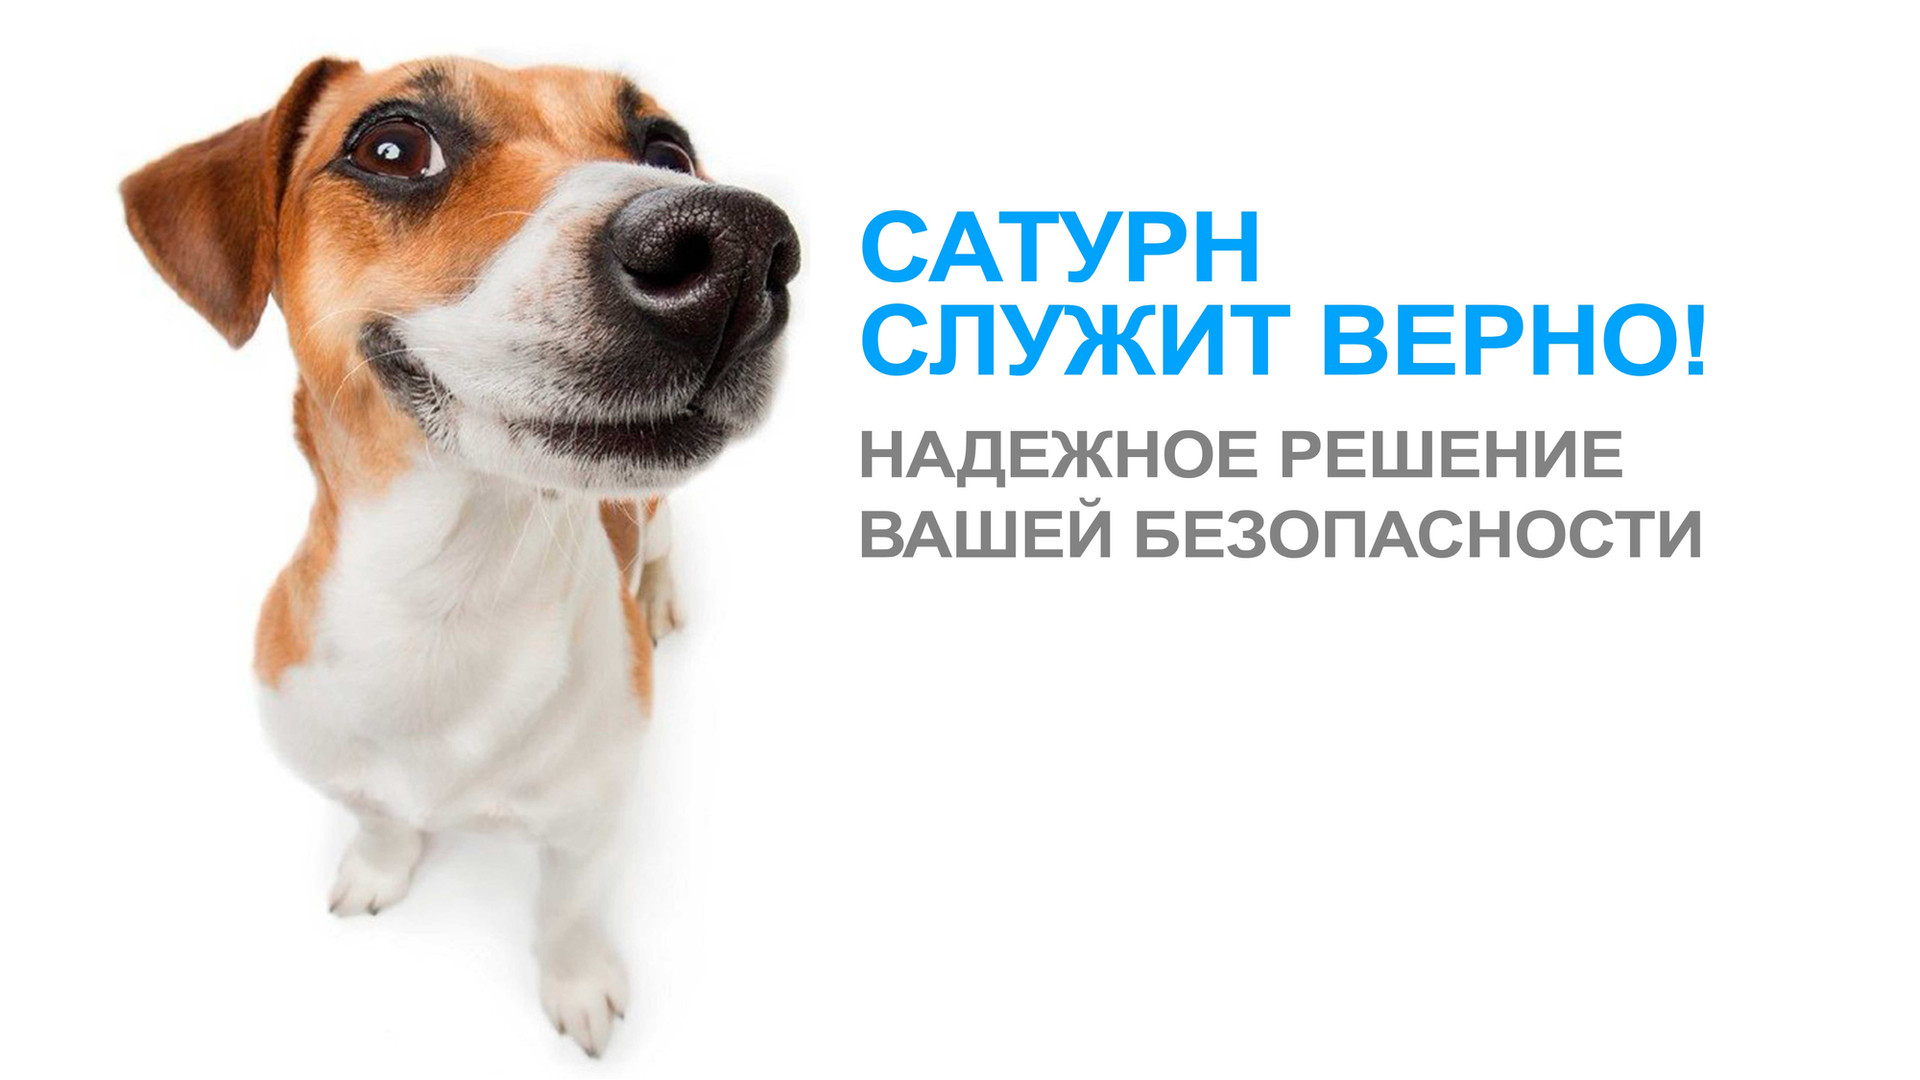 7С-СОБАЧКОЙ-ЗАСТАВКА.jpg